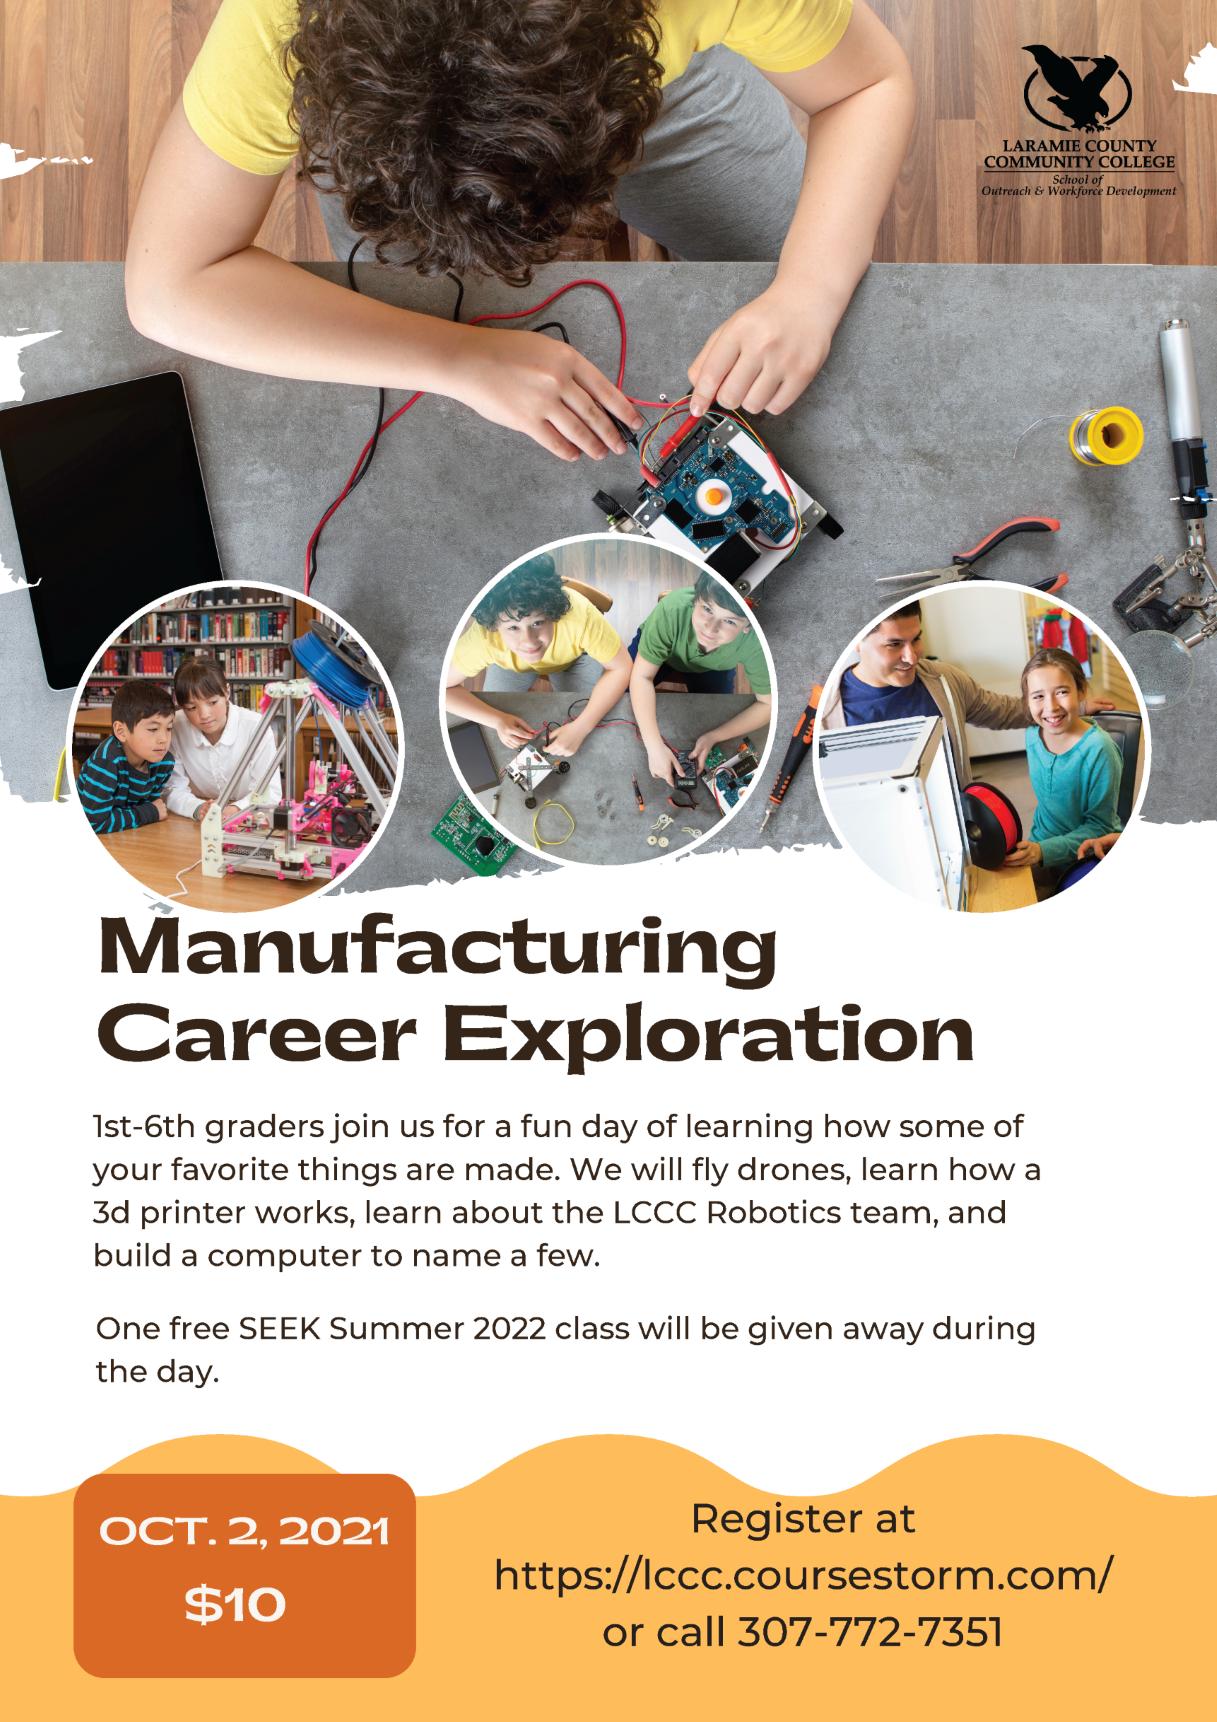 Manufacturing Career Exploration